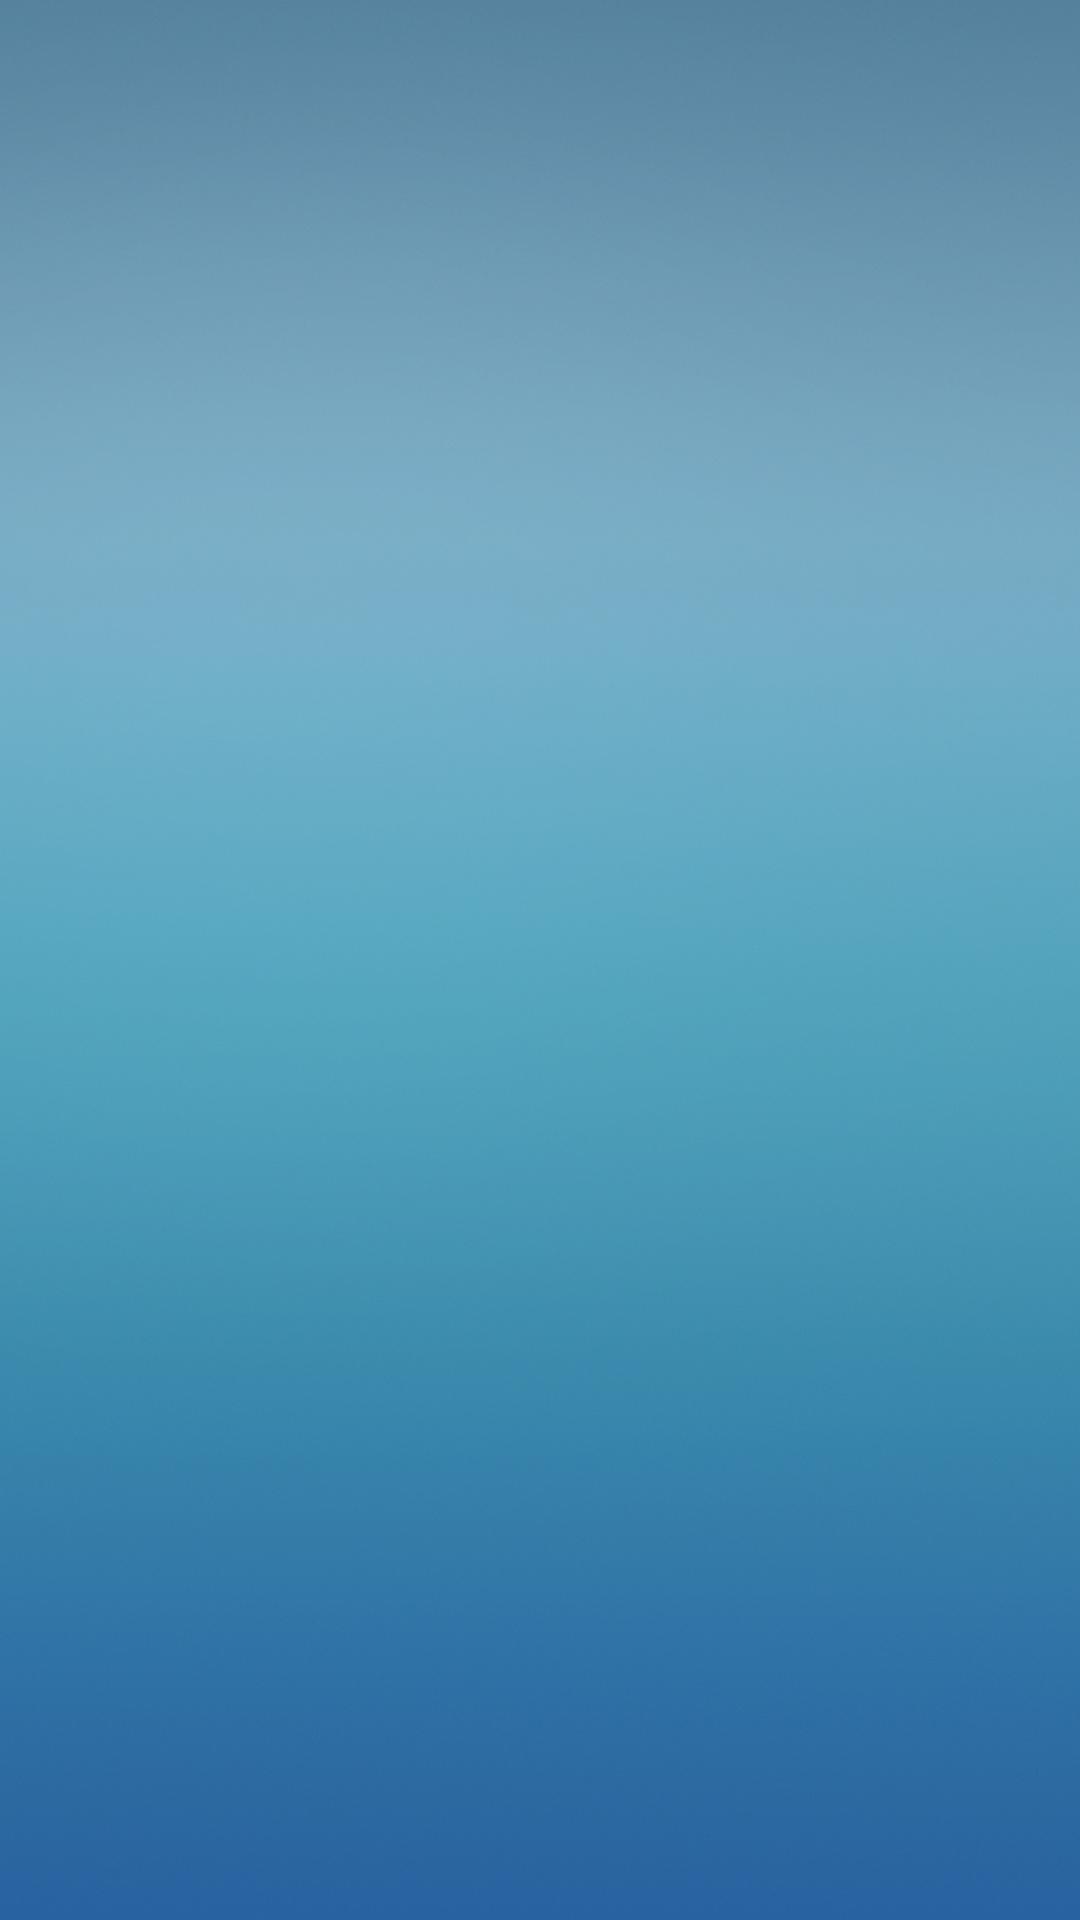 Download Samsung Galaxy J7 2017 Stock Wallpapers Droidviews